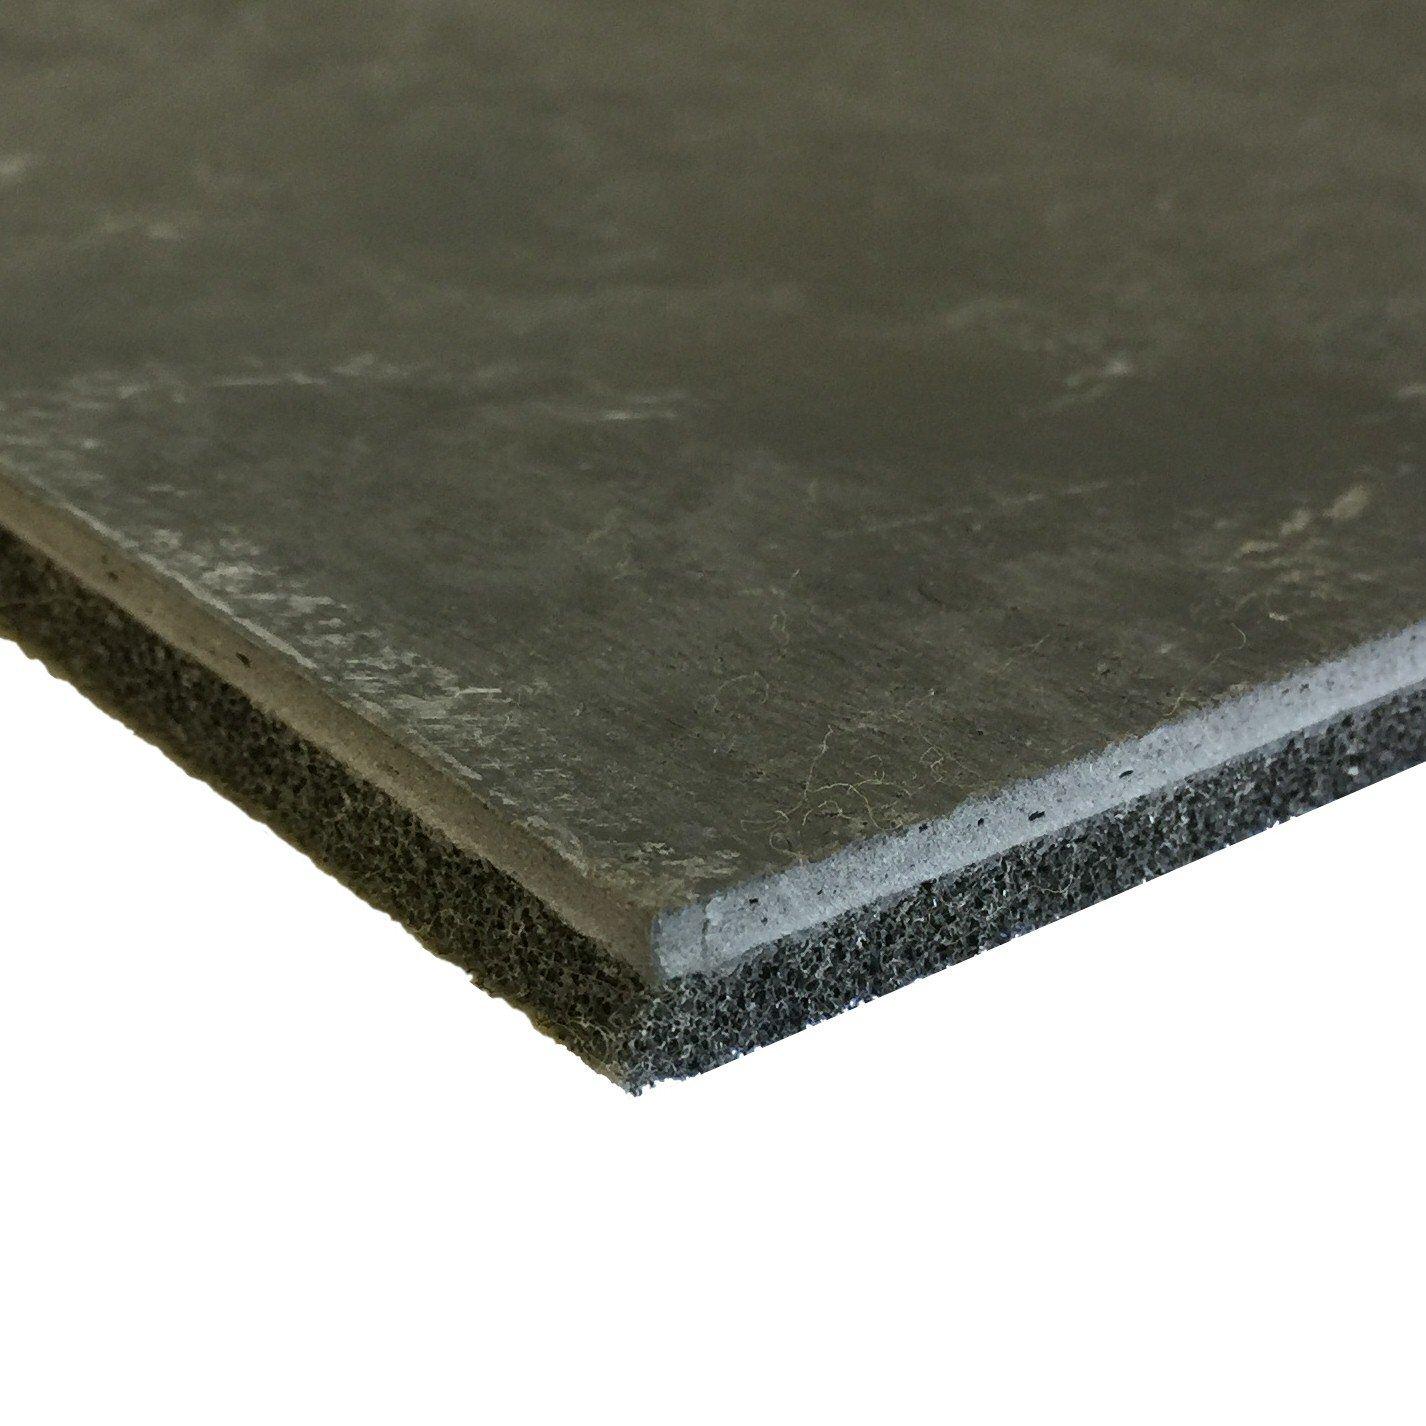 Prosound Soundmat 2 Timber Floor Soundproofing 9mm